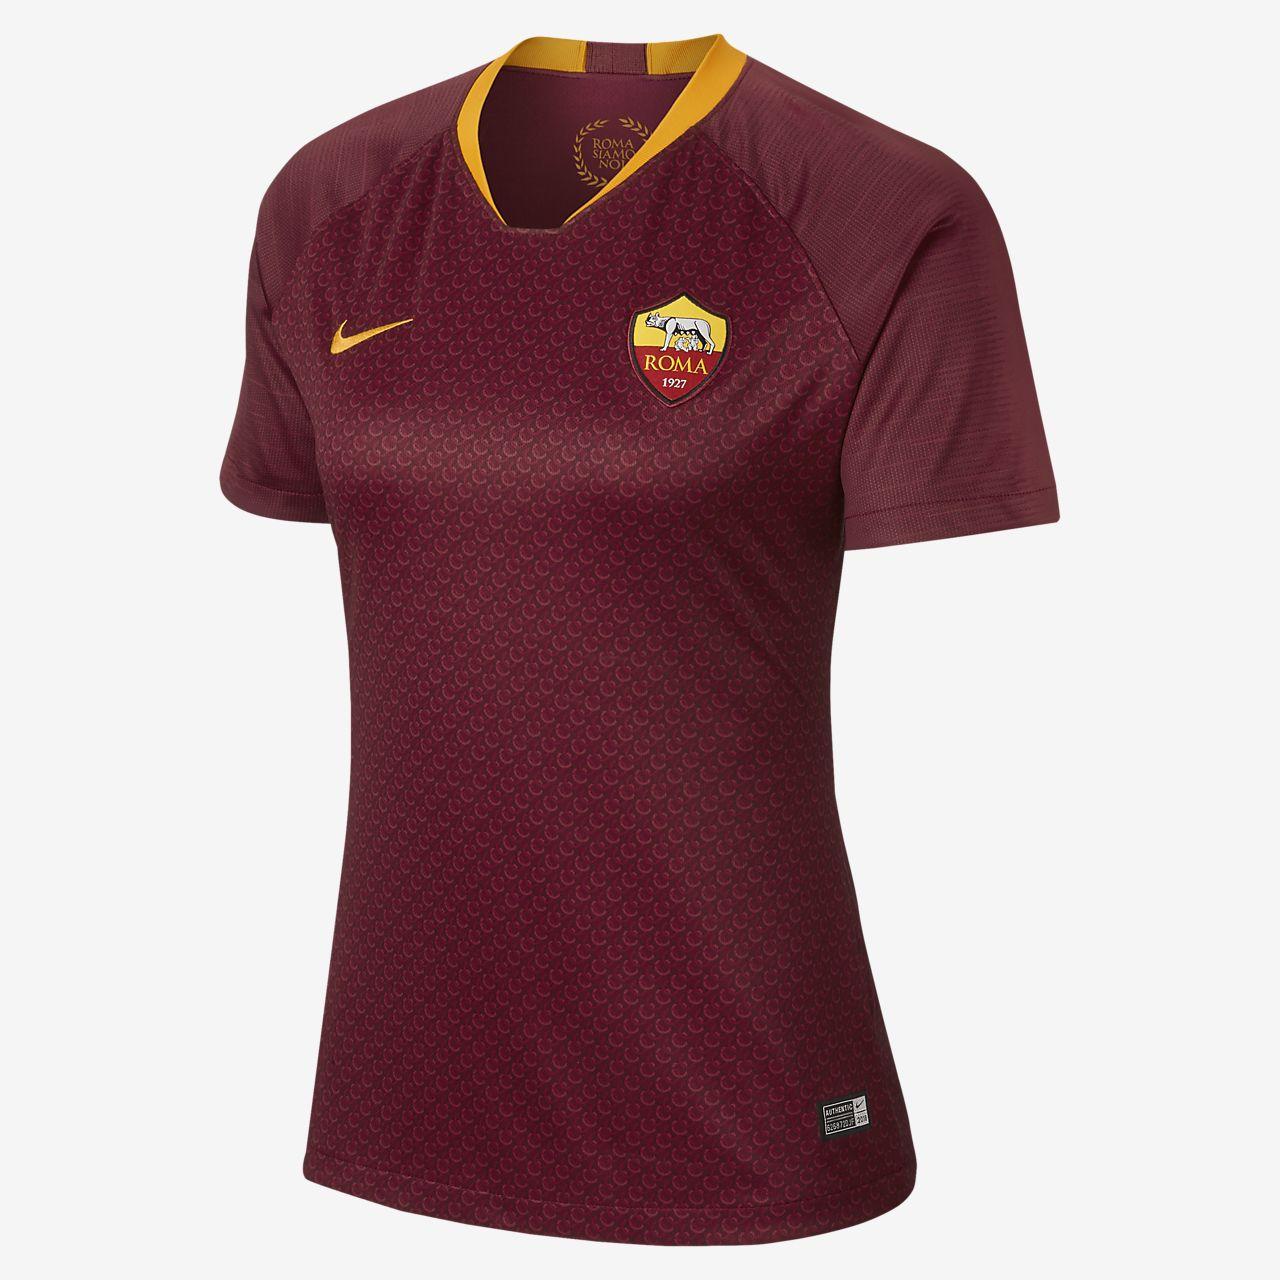 2018/19 AS Roma Stadium Home Women's Football Shirt